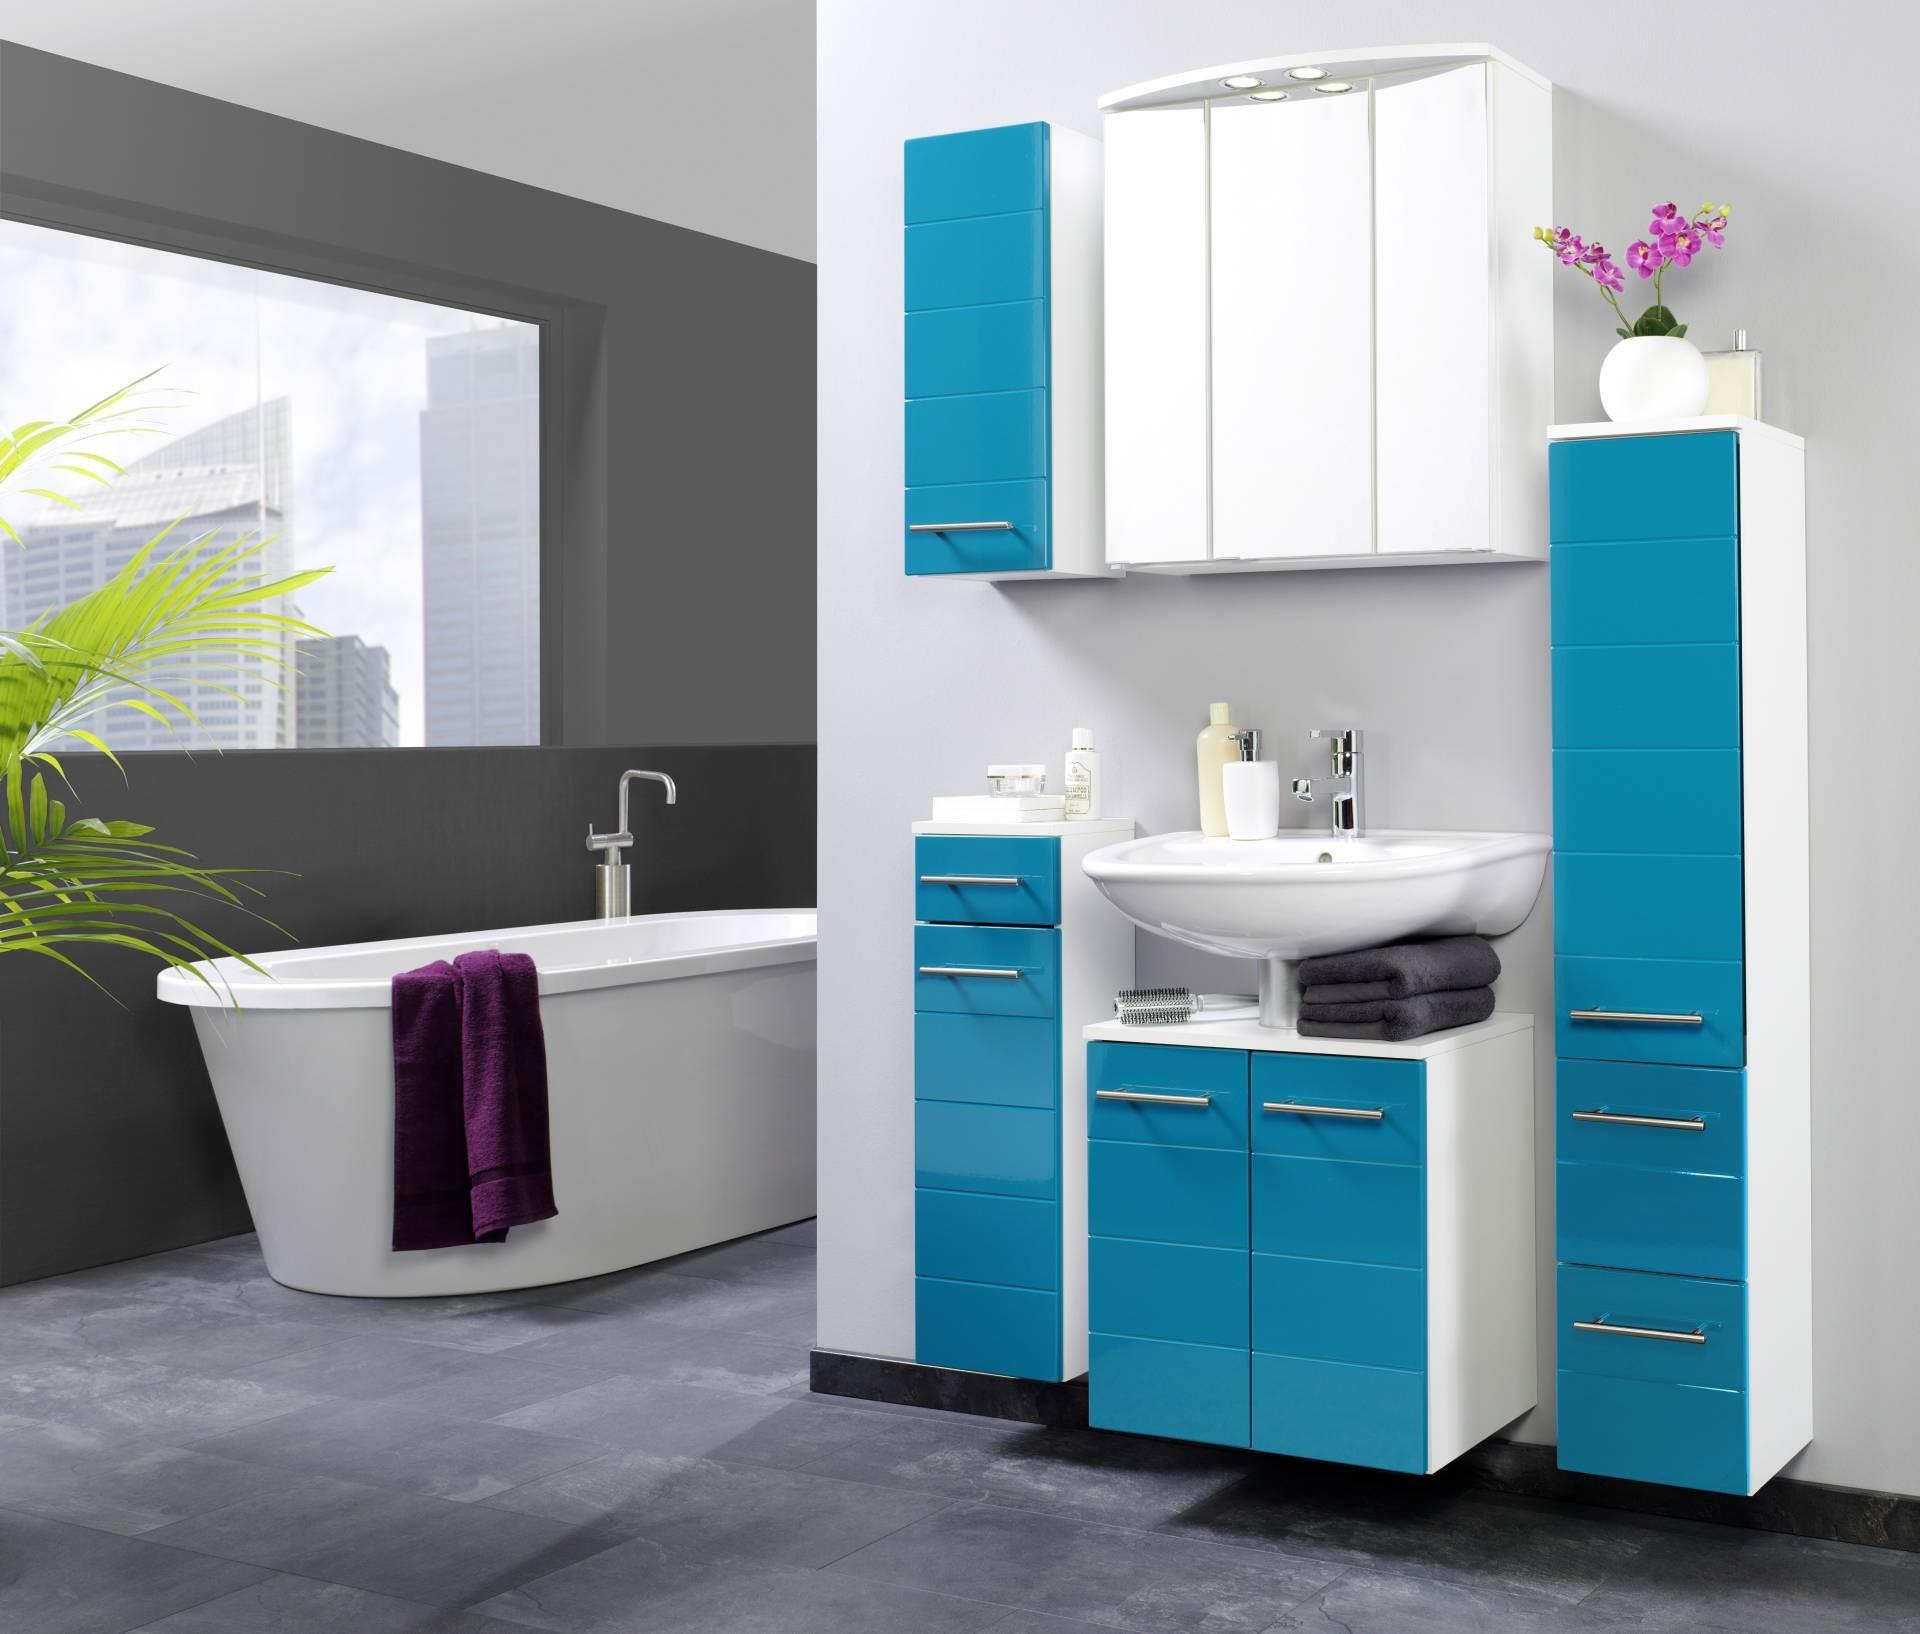 mosaikfliesen türkis ideen (292 bilder) | roomido.com. badezimmer ... - Moderne Badezimmer Trkis